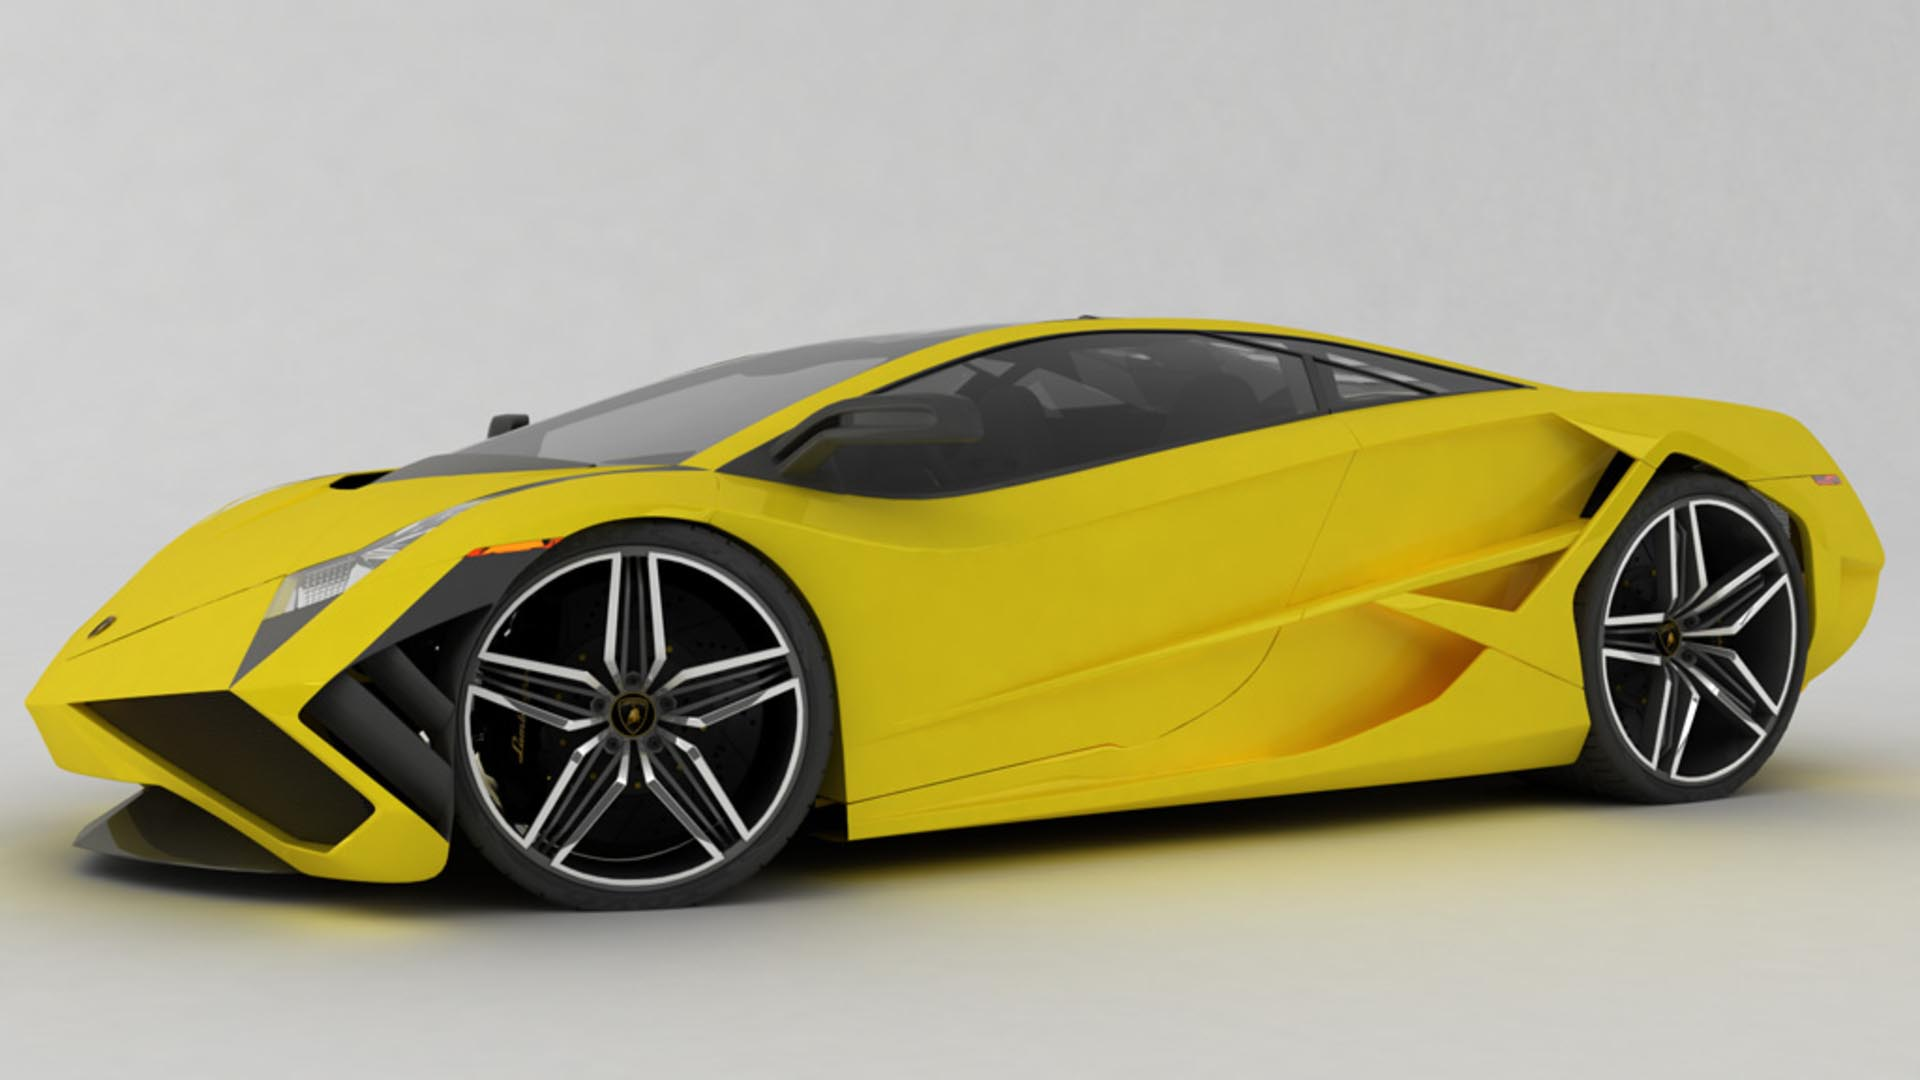 High resolution hd wallpapers cars wallpapersafari - Future cars hd wallpapers ...